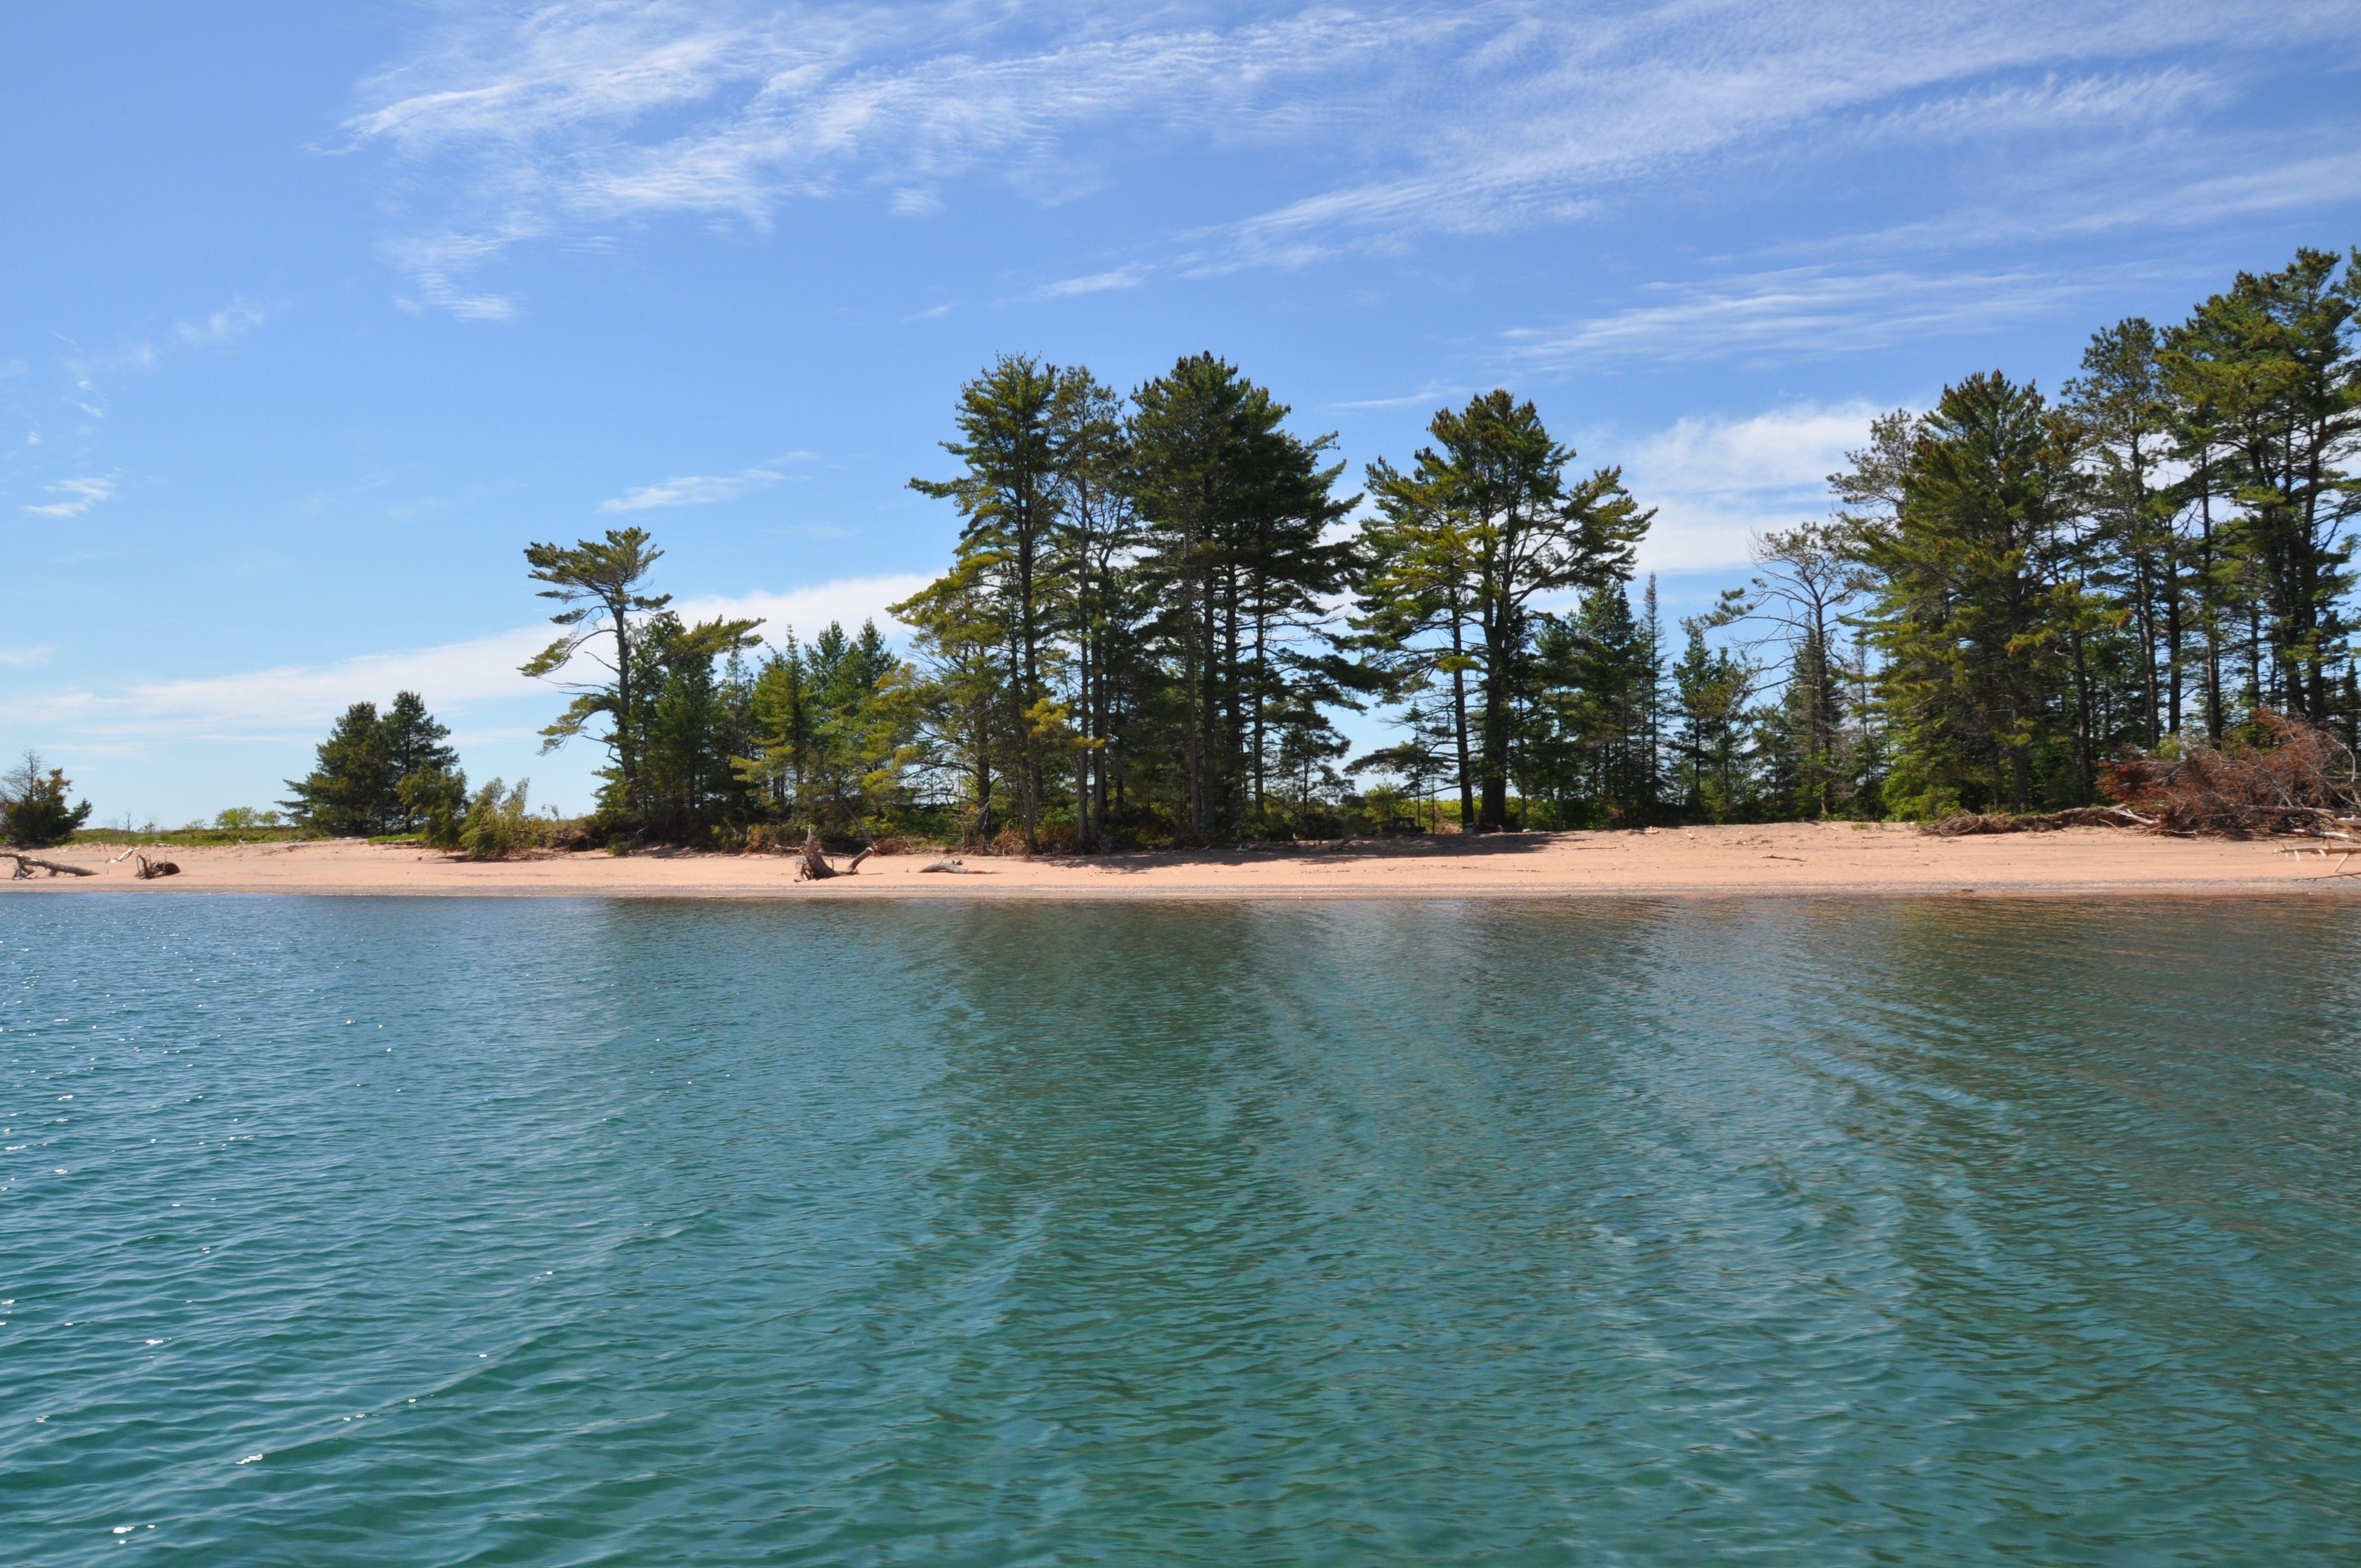 Beaches Apostle Islands National Lakeshore Apostle Islands Wisconsin Vacation Apostle Islands National Lakeshore